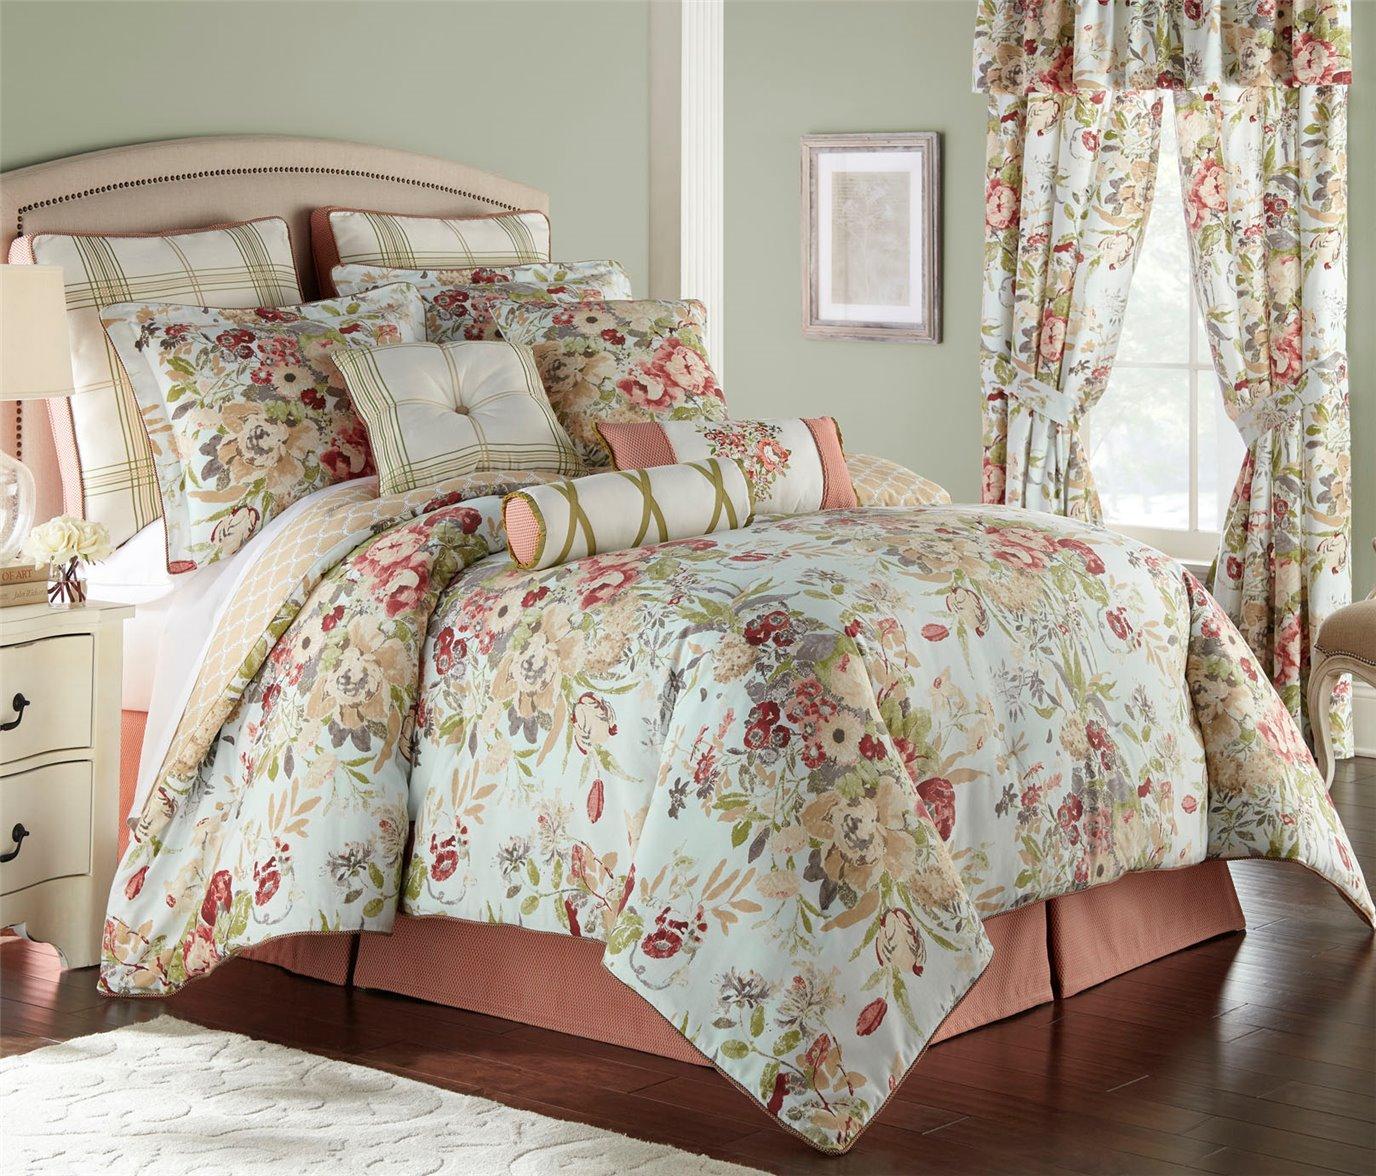 Lorraine 4 Piece King Comforter Set